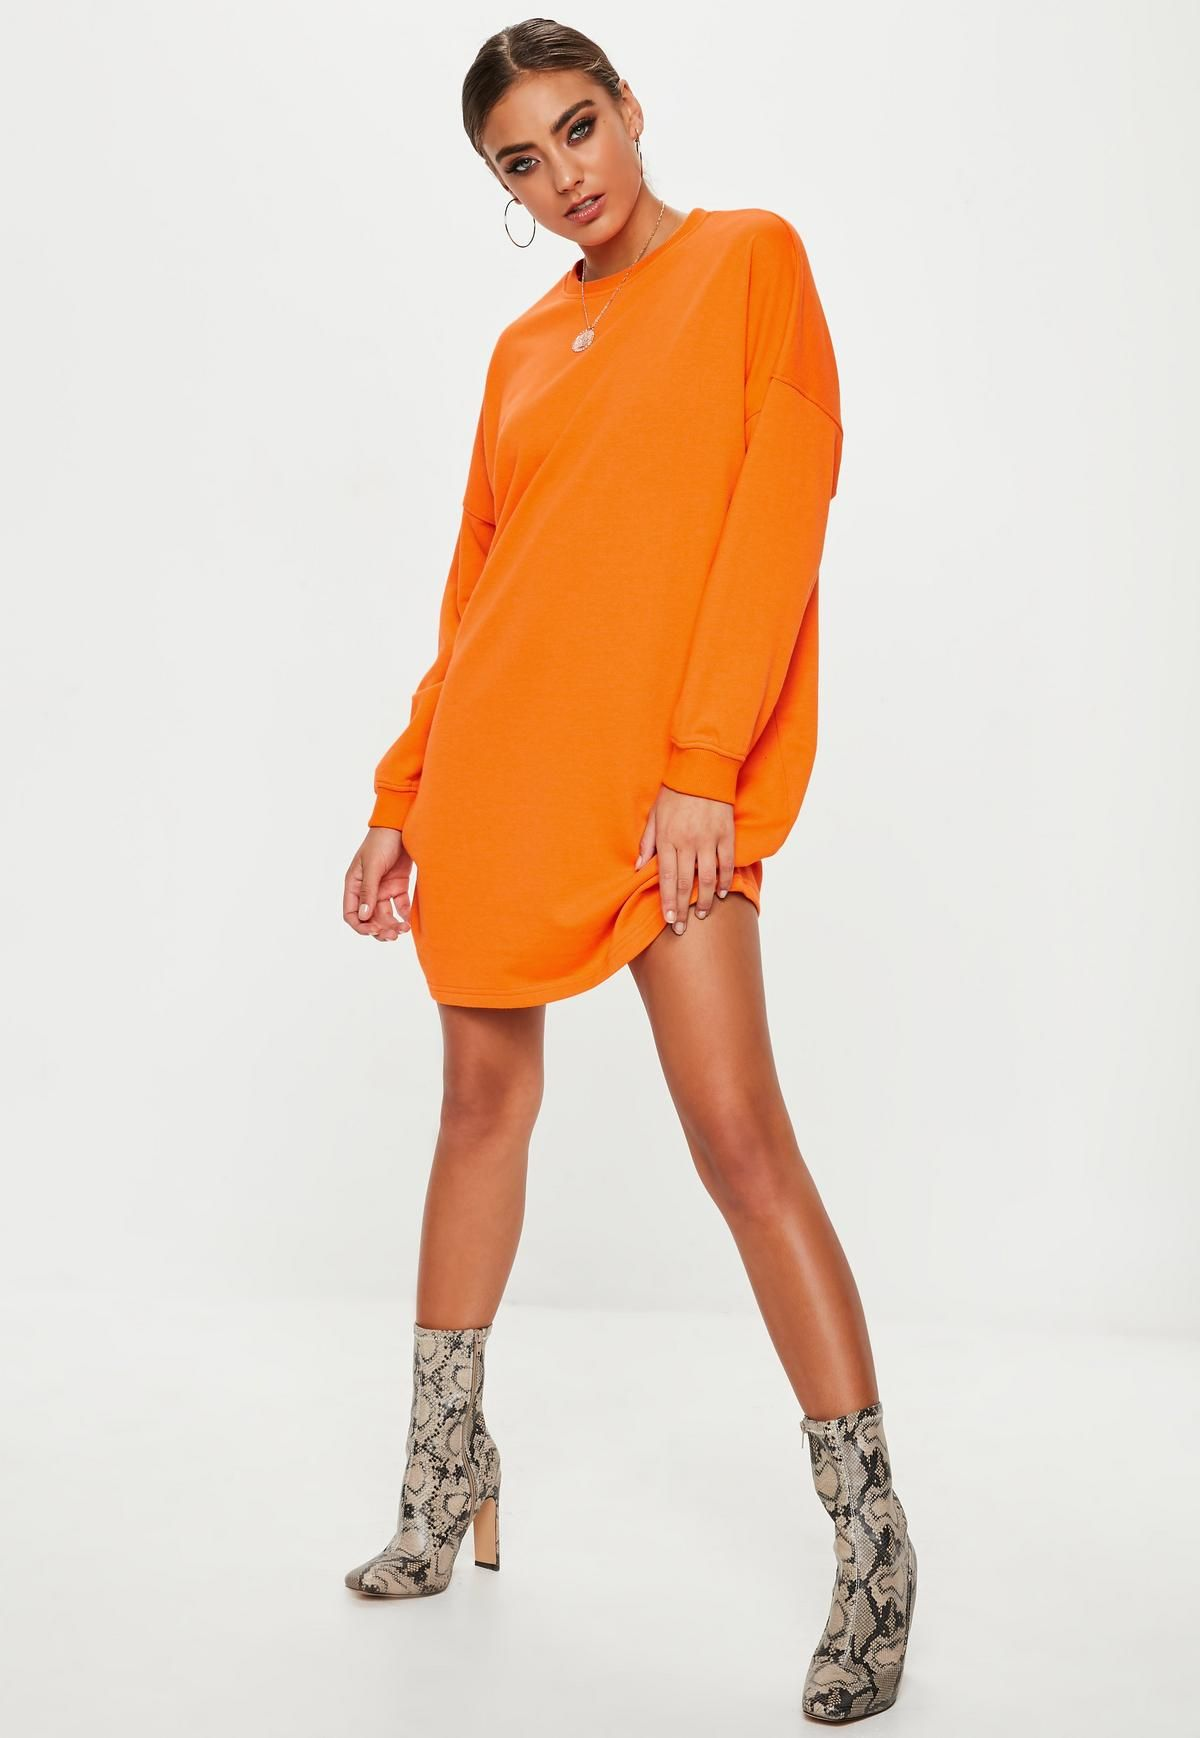 Oversized Dress Orange Sweater Crew Missguided Wardrobe Neck nqrrE8